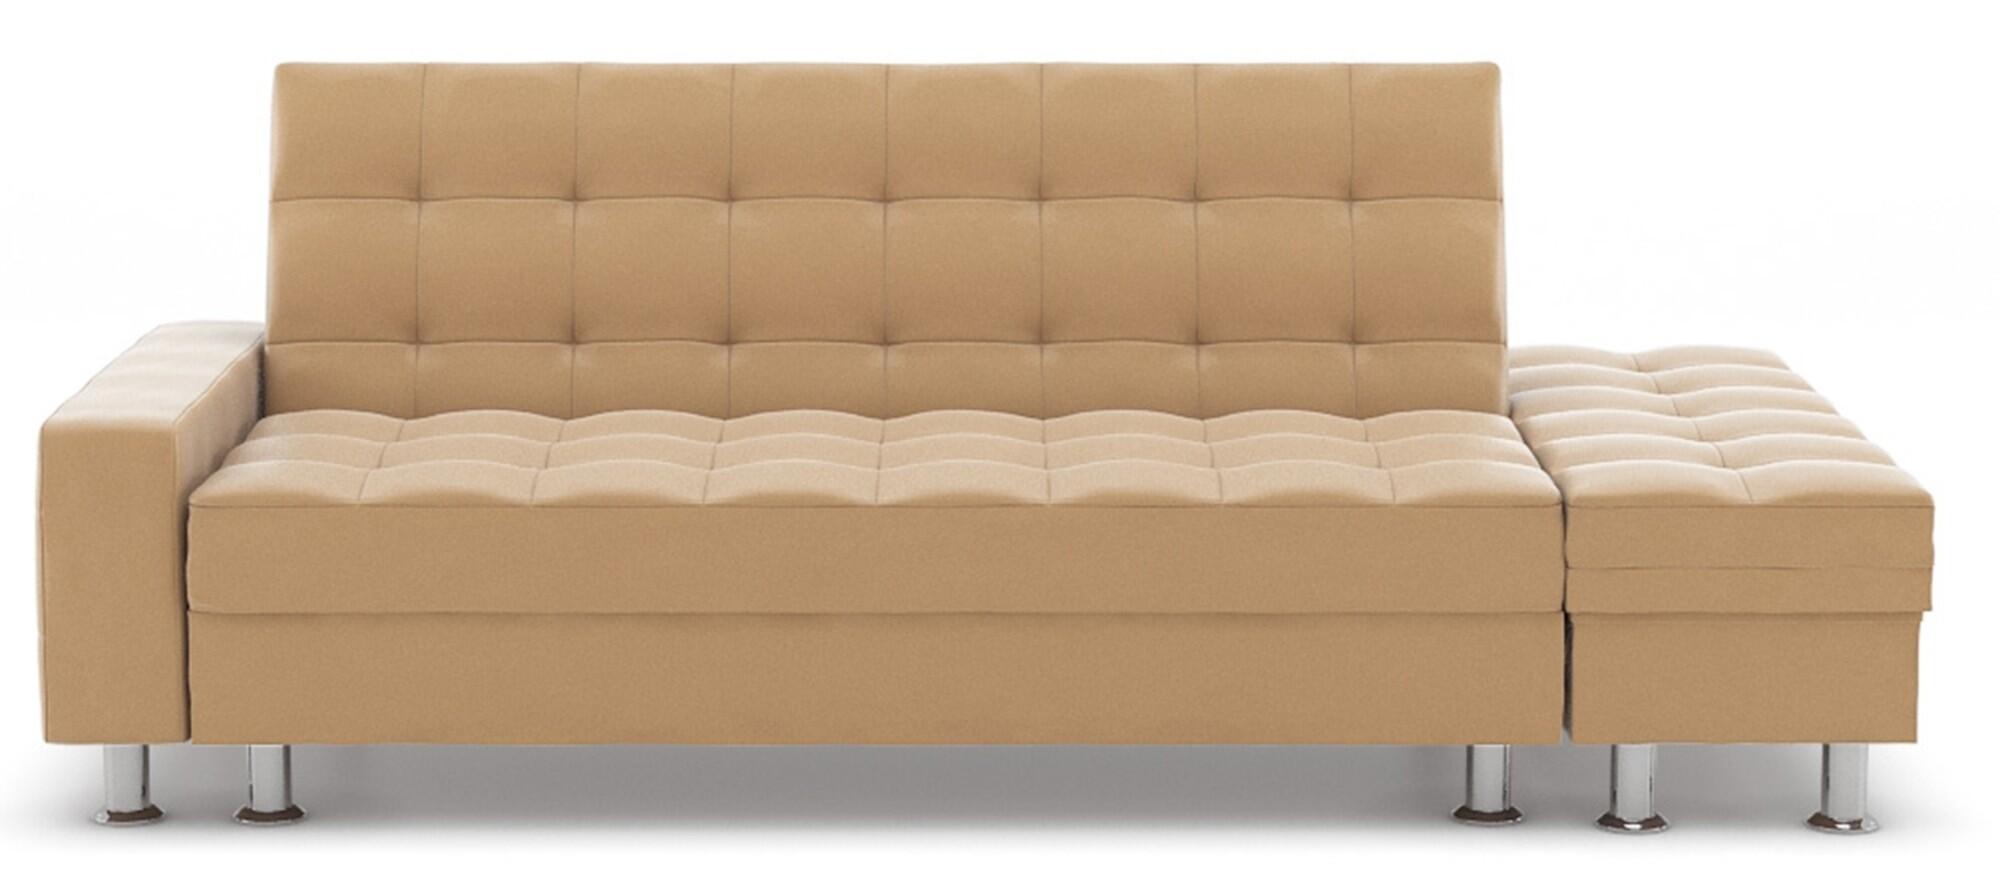 Thora Multi Storage Sofa Bed Pvc Champagne Furniture Home